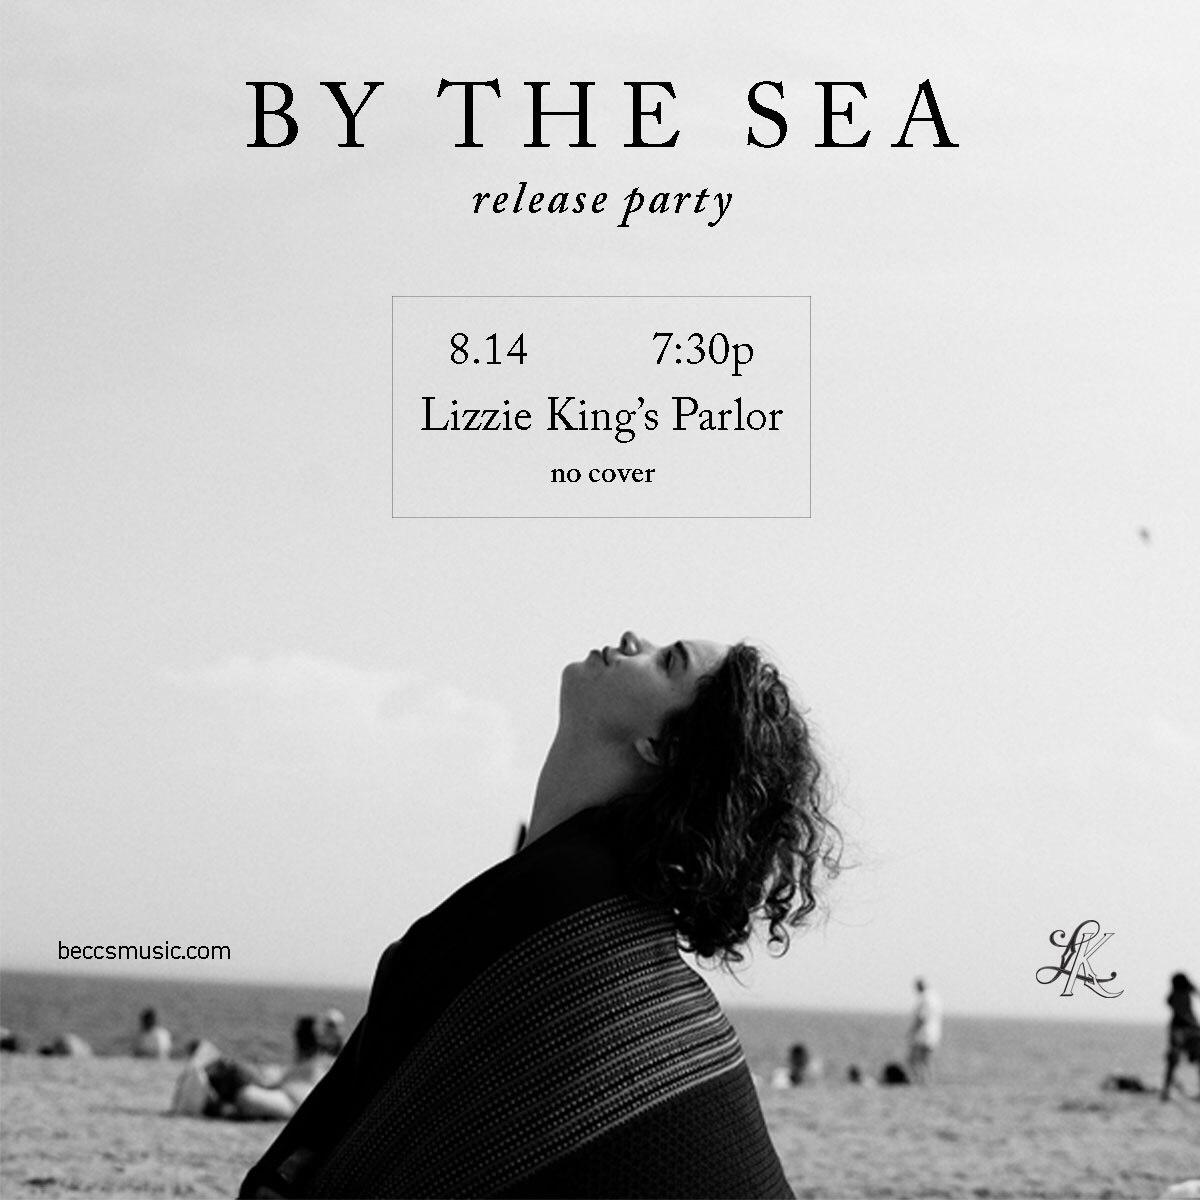 lizzie king release party.JPG